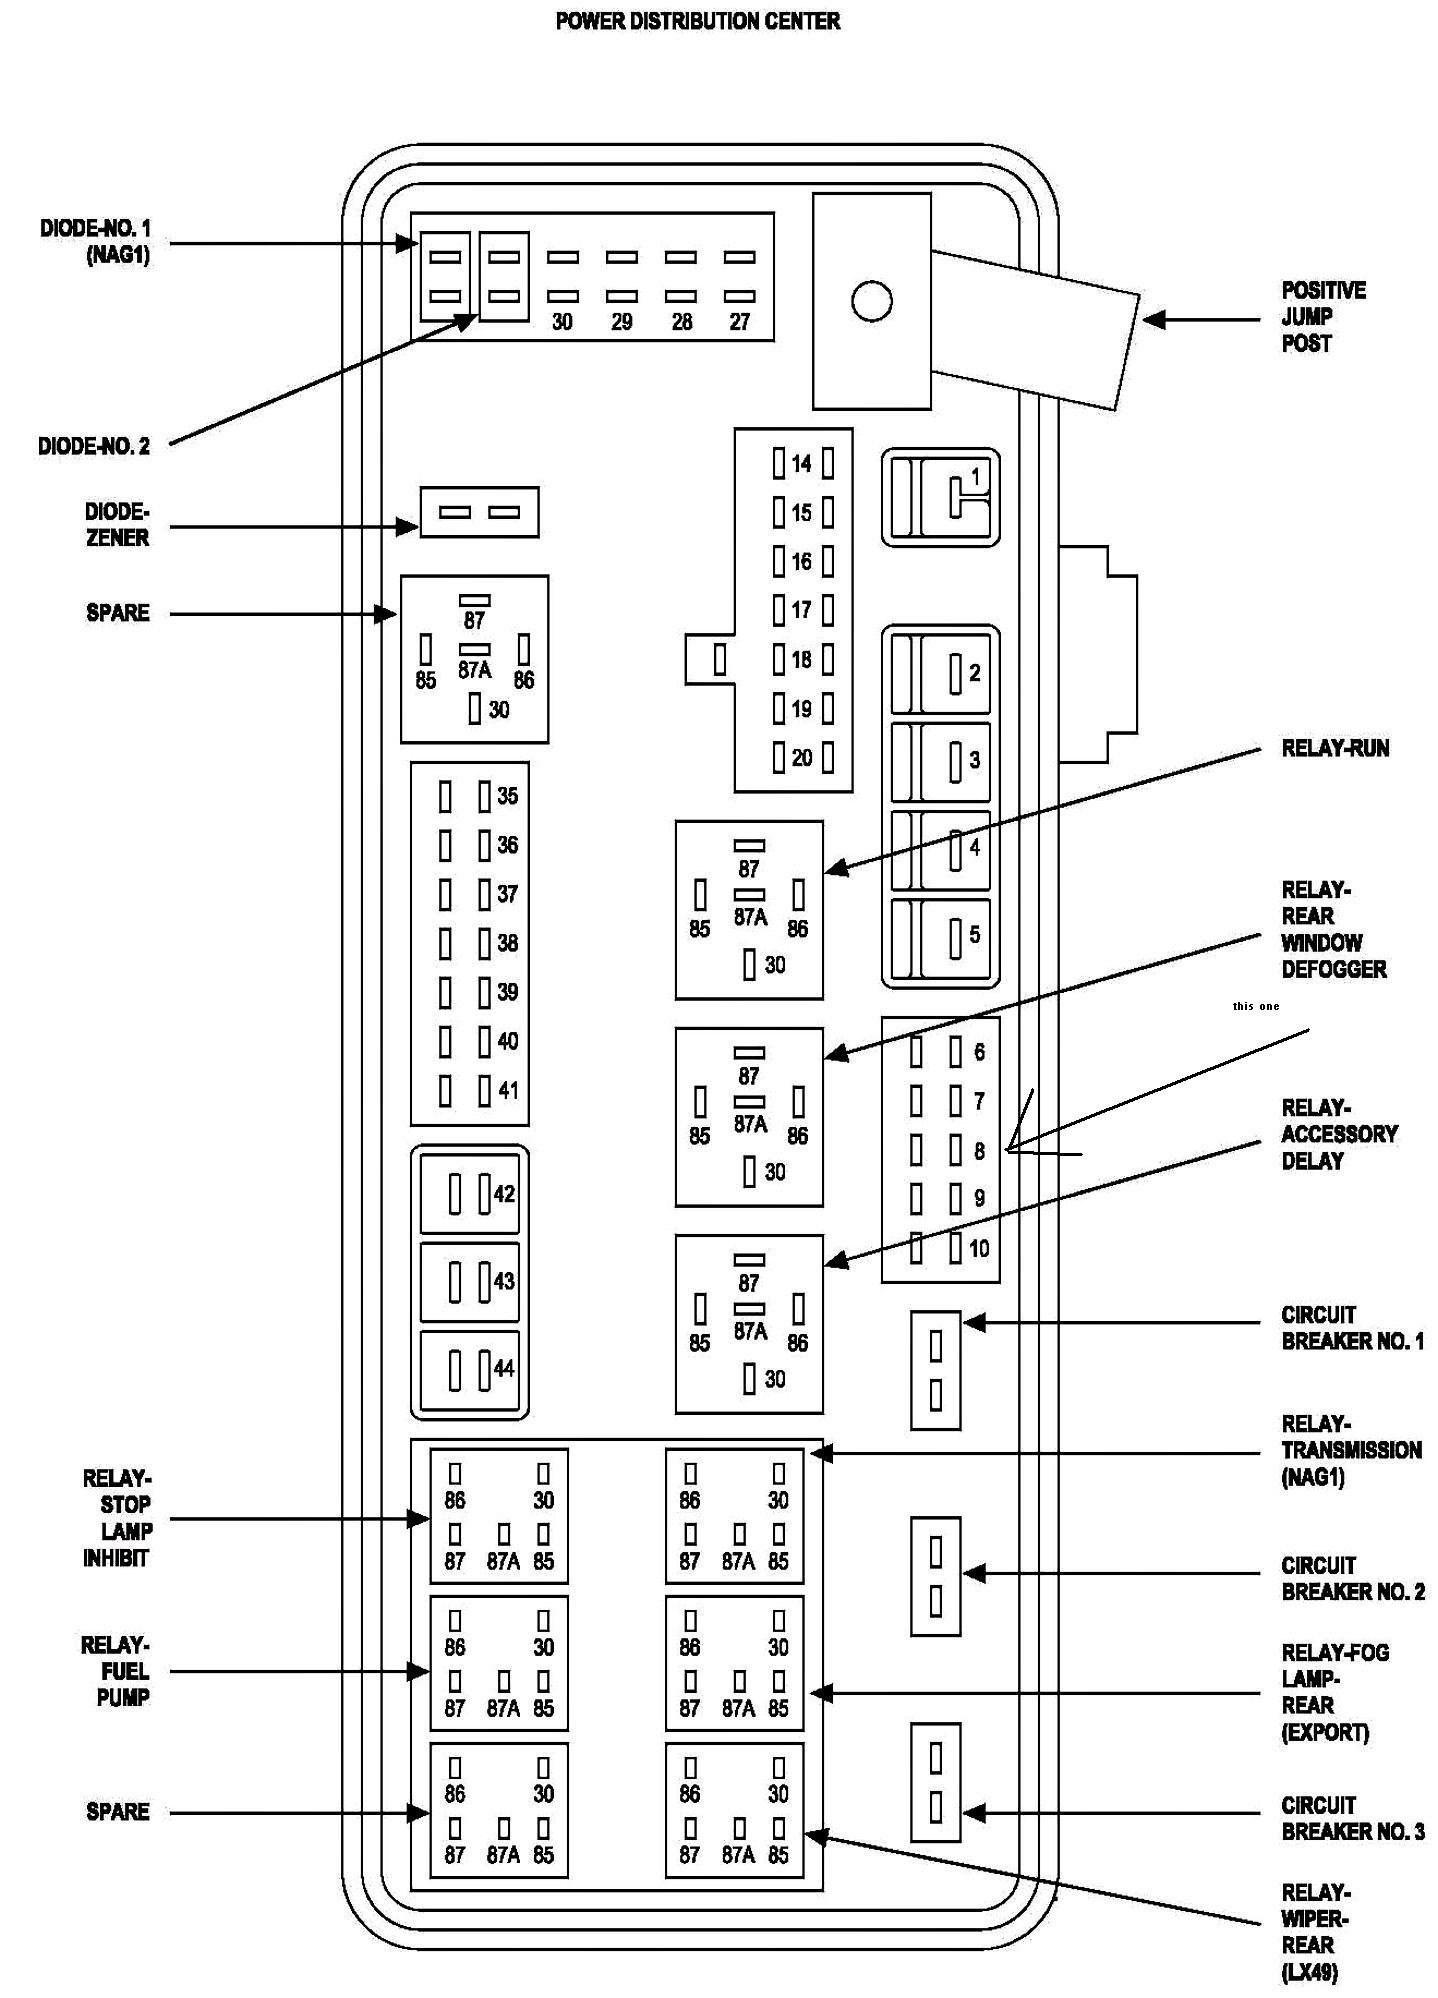 2006 Dodge Ram 1500 Fuse Box Diagram : dodge, diagram, Dodge, Diagram, Wiring, Just-friend, Just-friend.ristorantebotticella.it